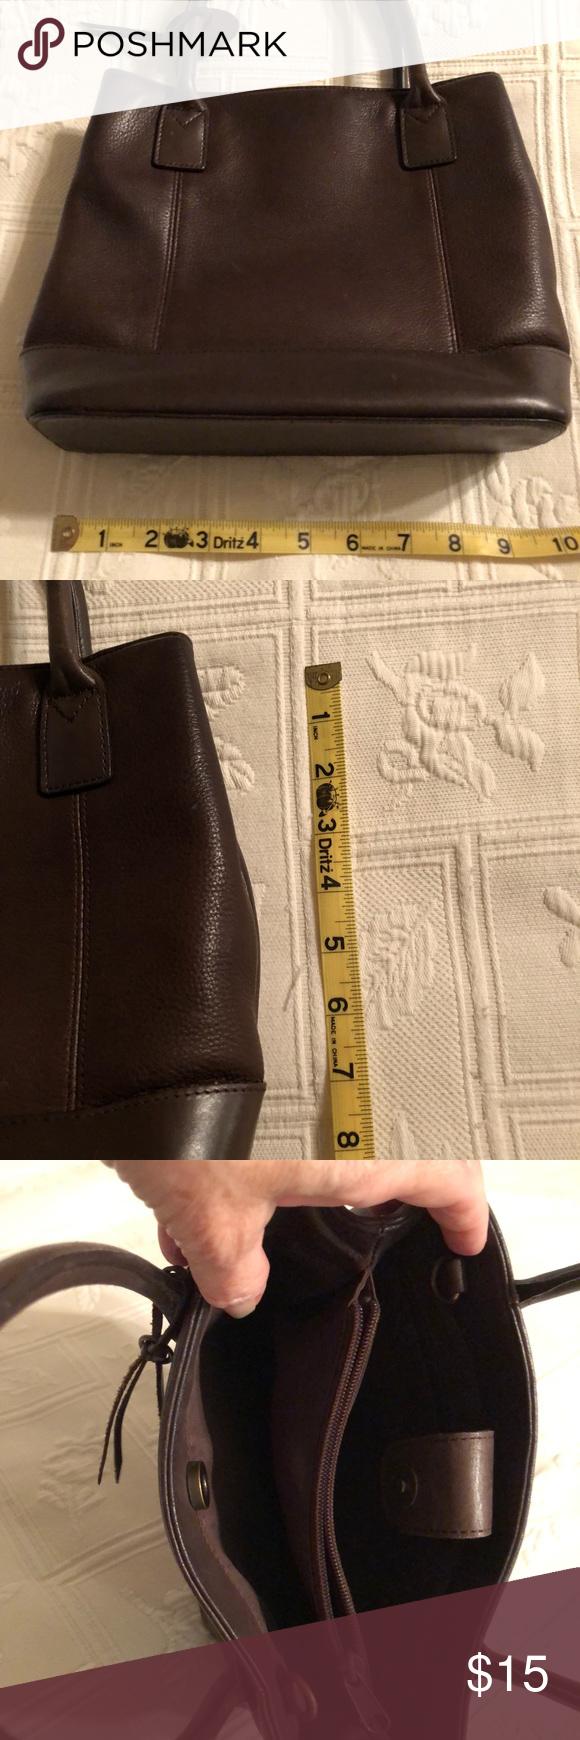 Handbag Brown leather handbag in great condition Wilsons